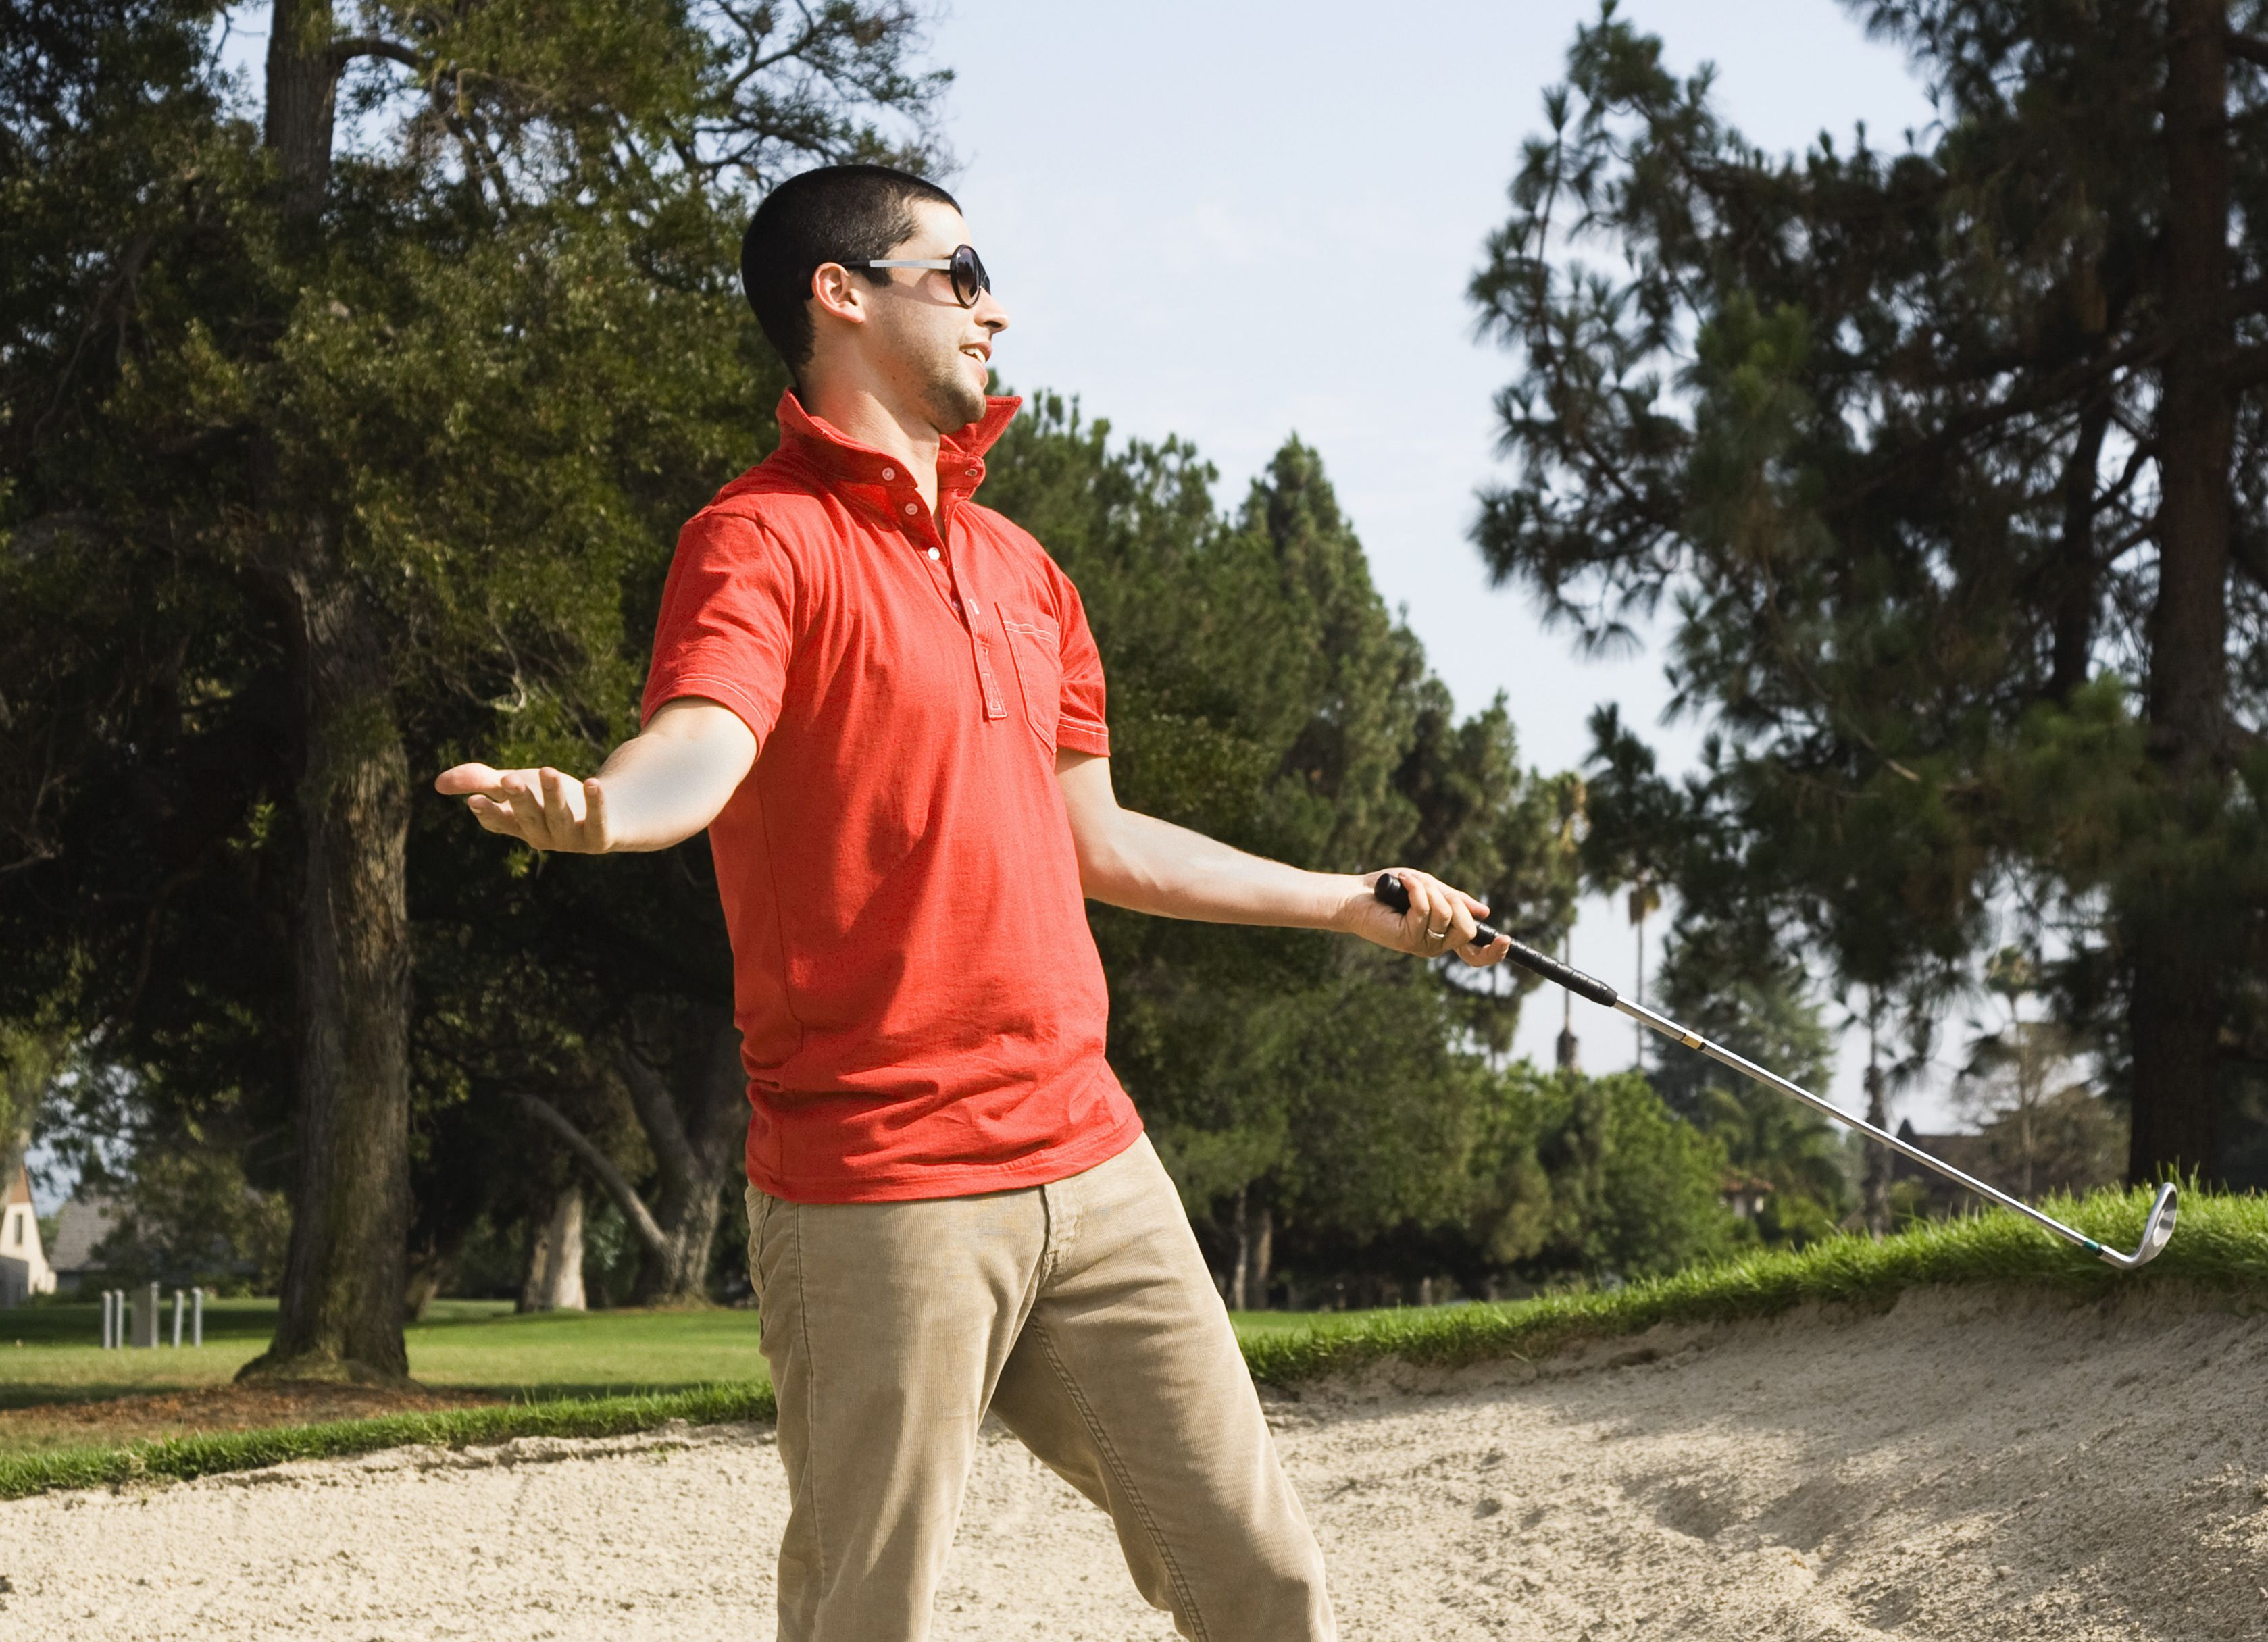 golfer shrugging